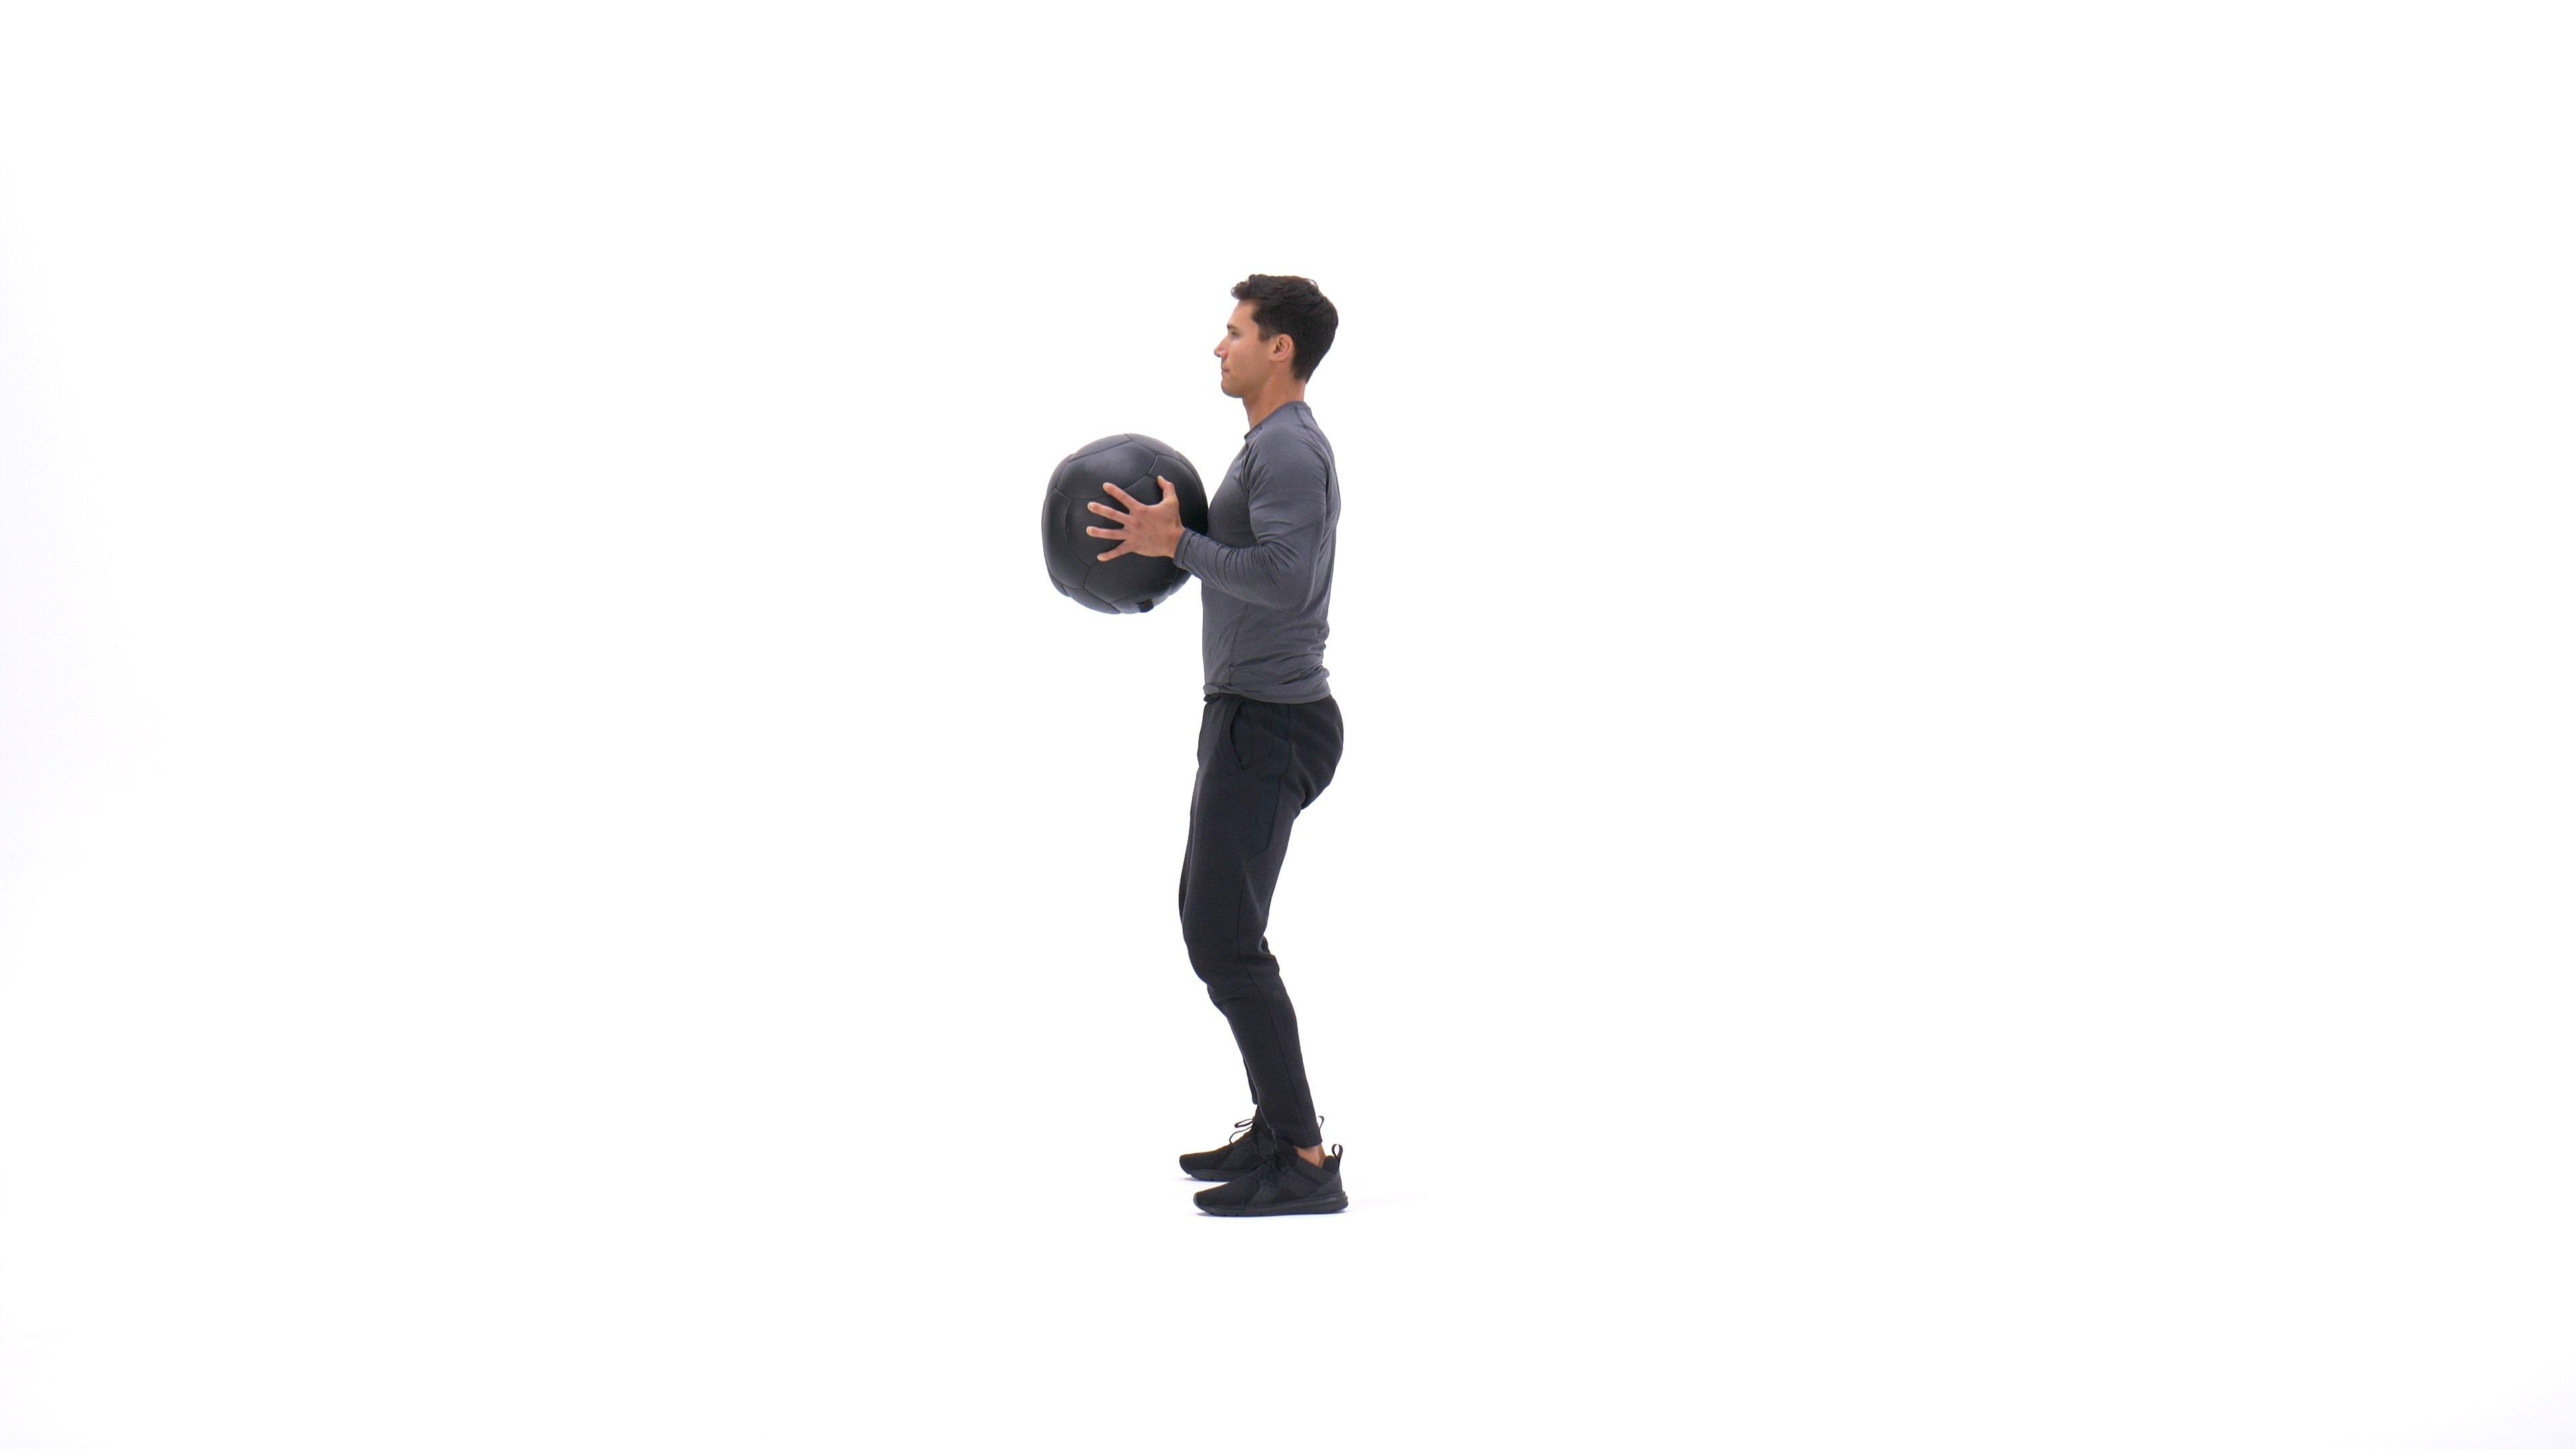 Medicine ball sprawl to chest press image